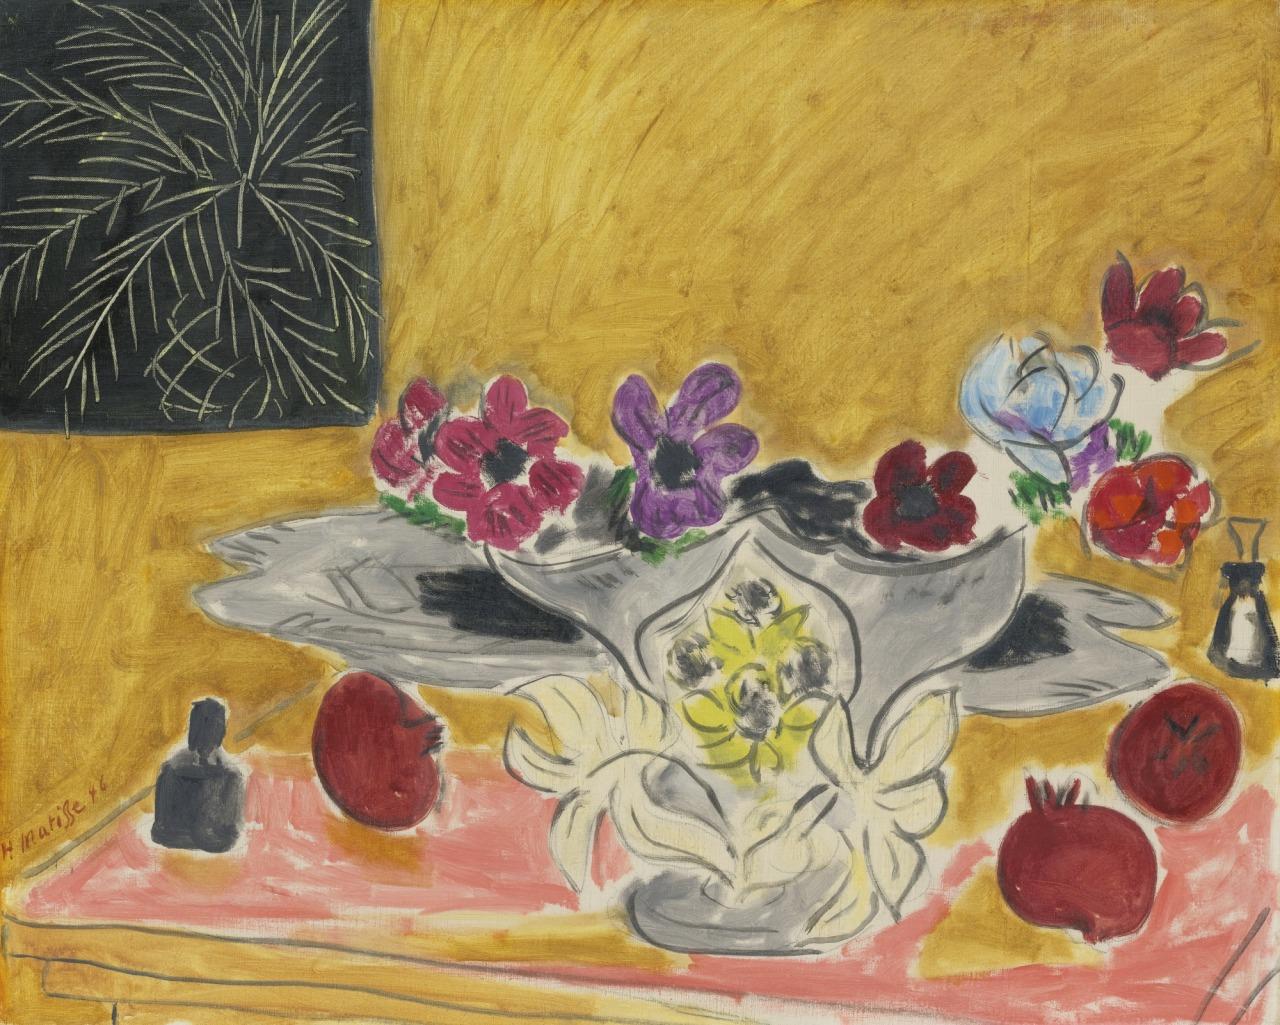 thunderstruck9:  Henri Matisse (French, 1869-1954), Anémones et grenades [Anemones and pomegranates], 1946. Oil on canvas, 65 x 81.2 cm.